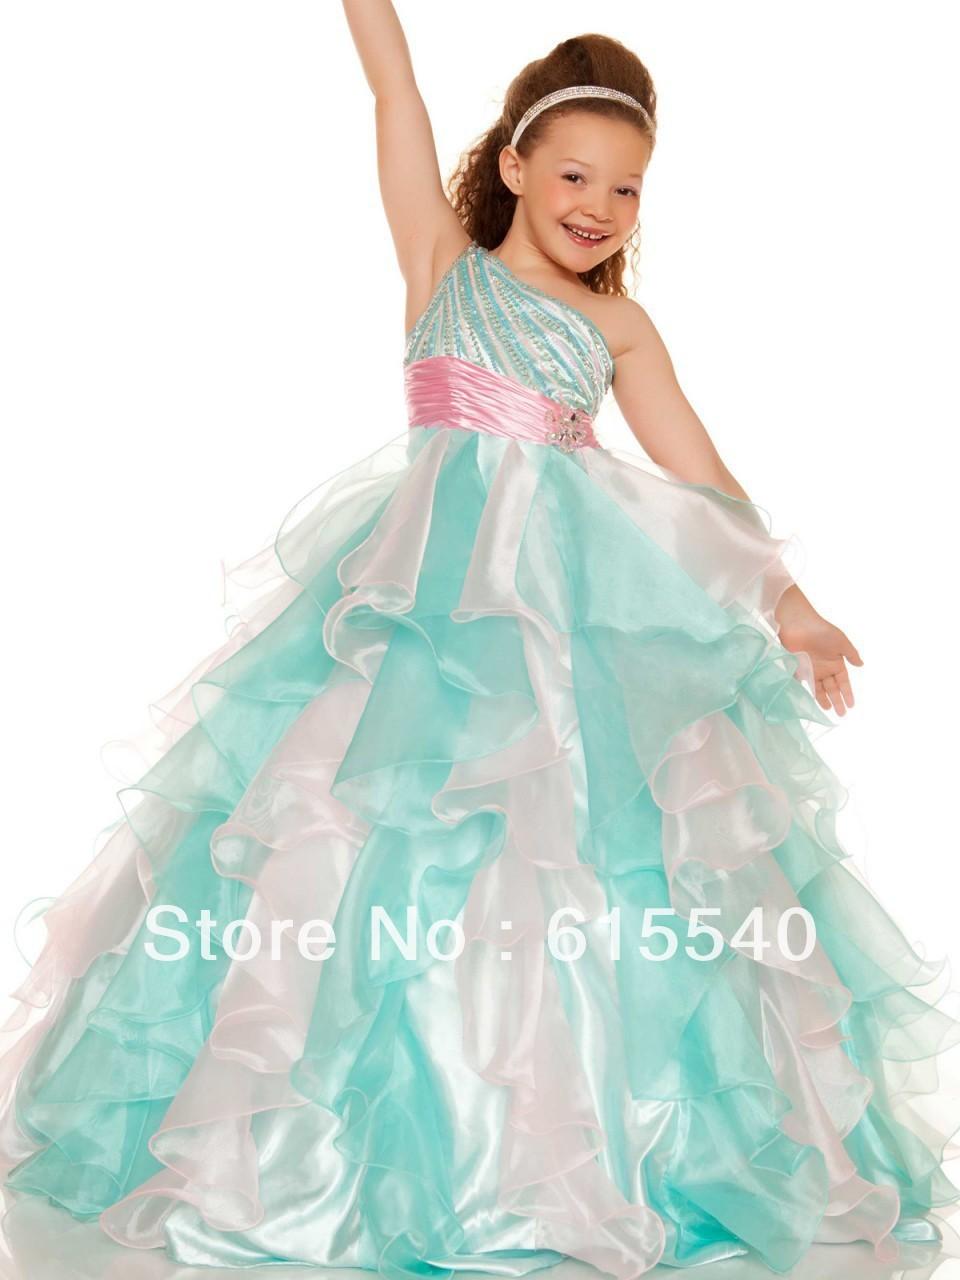 wedding dress sale online Glamorous grey floor length evening wear gown from stylish bazaar vddvn14